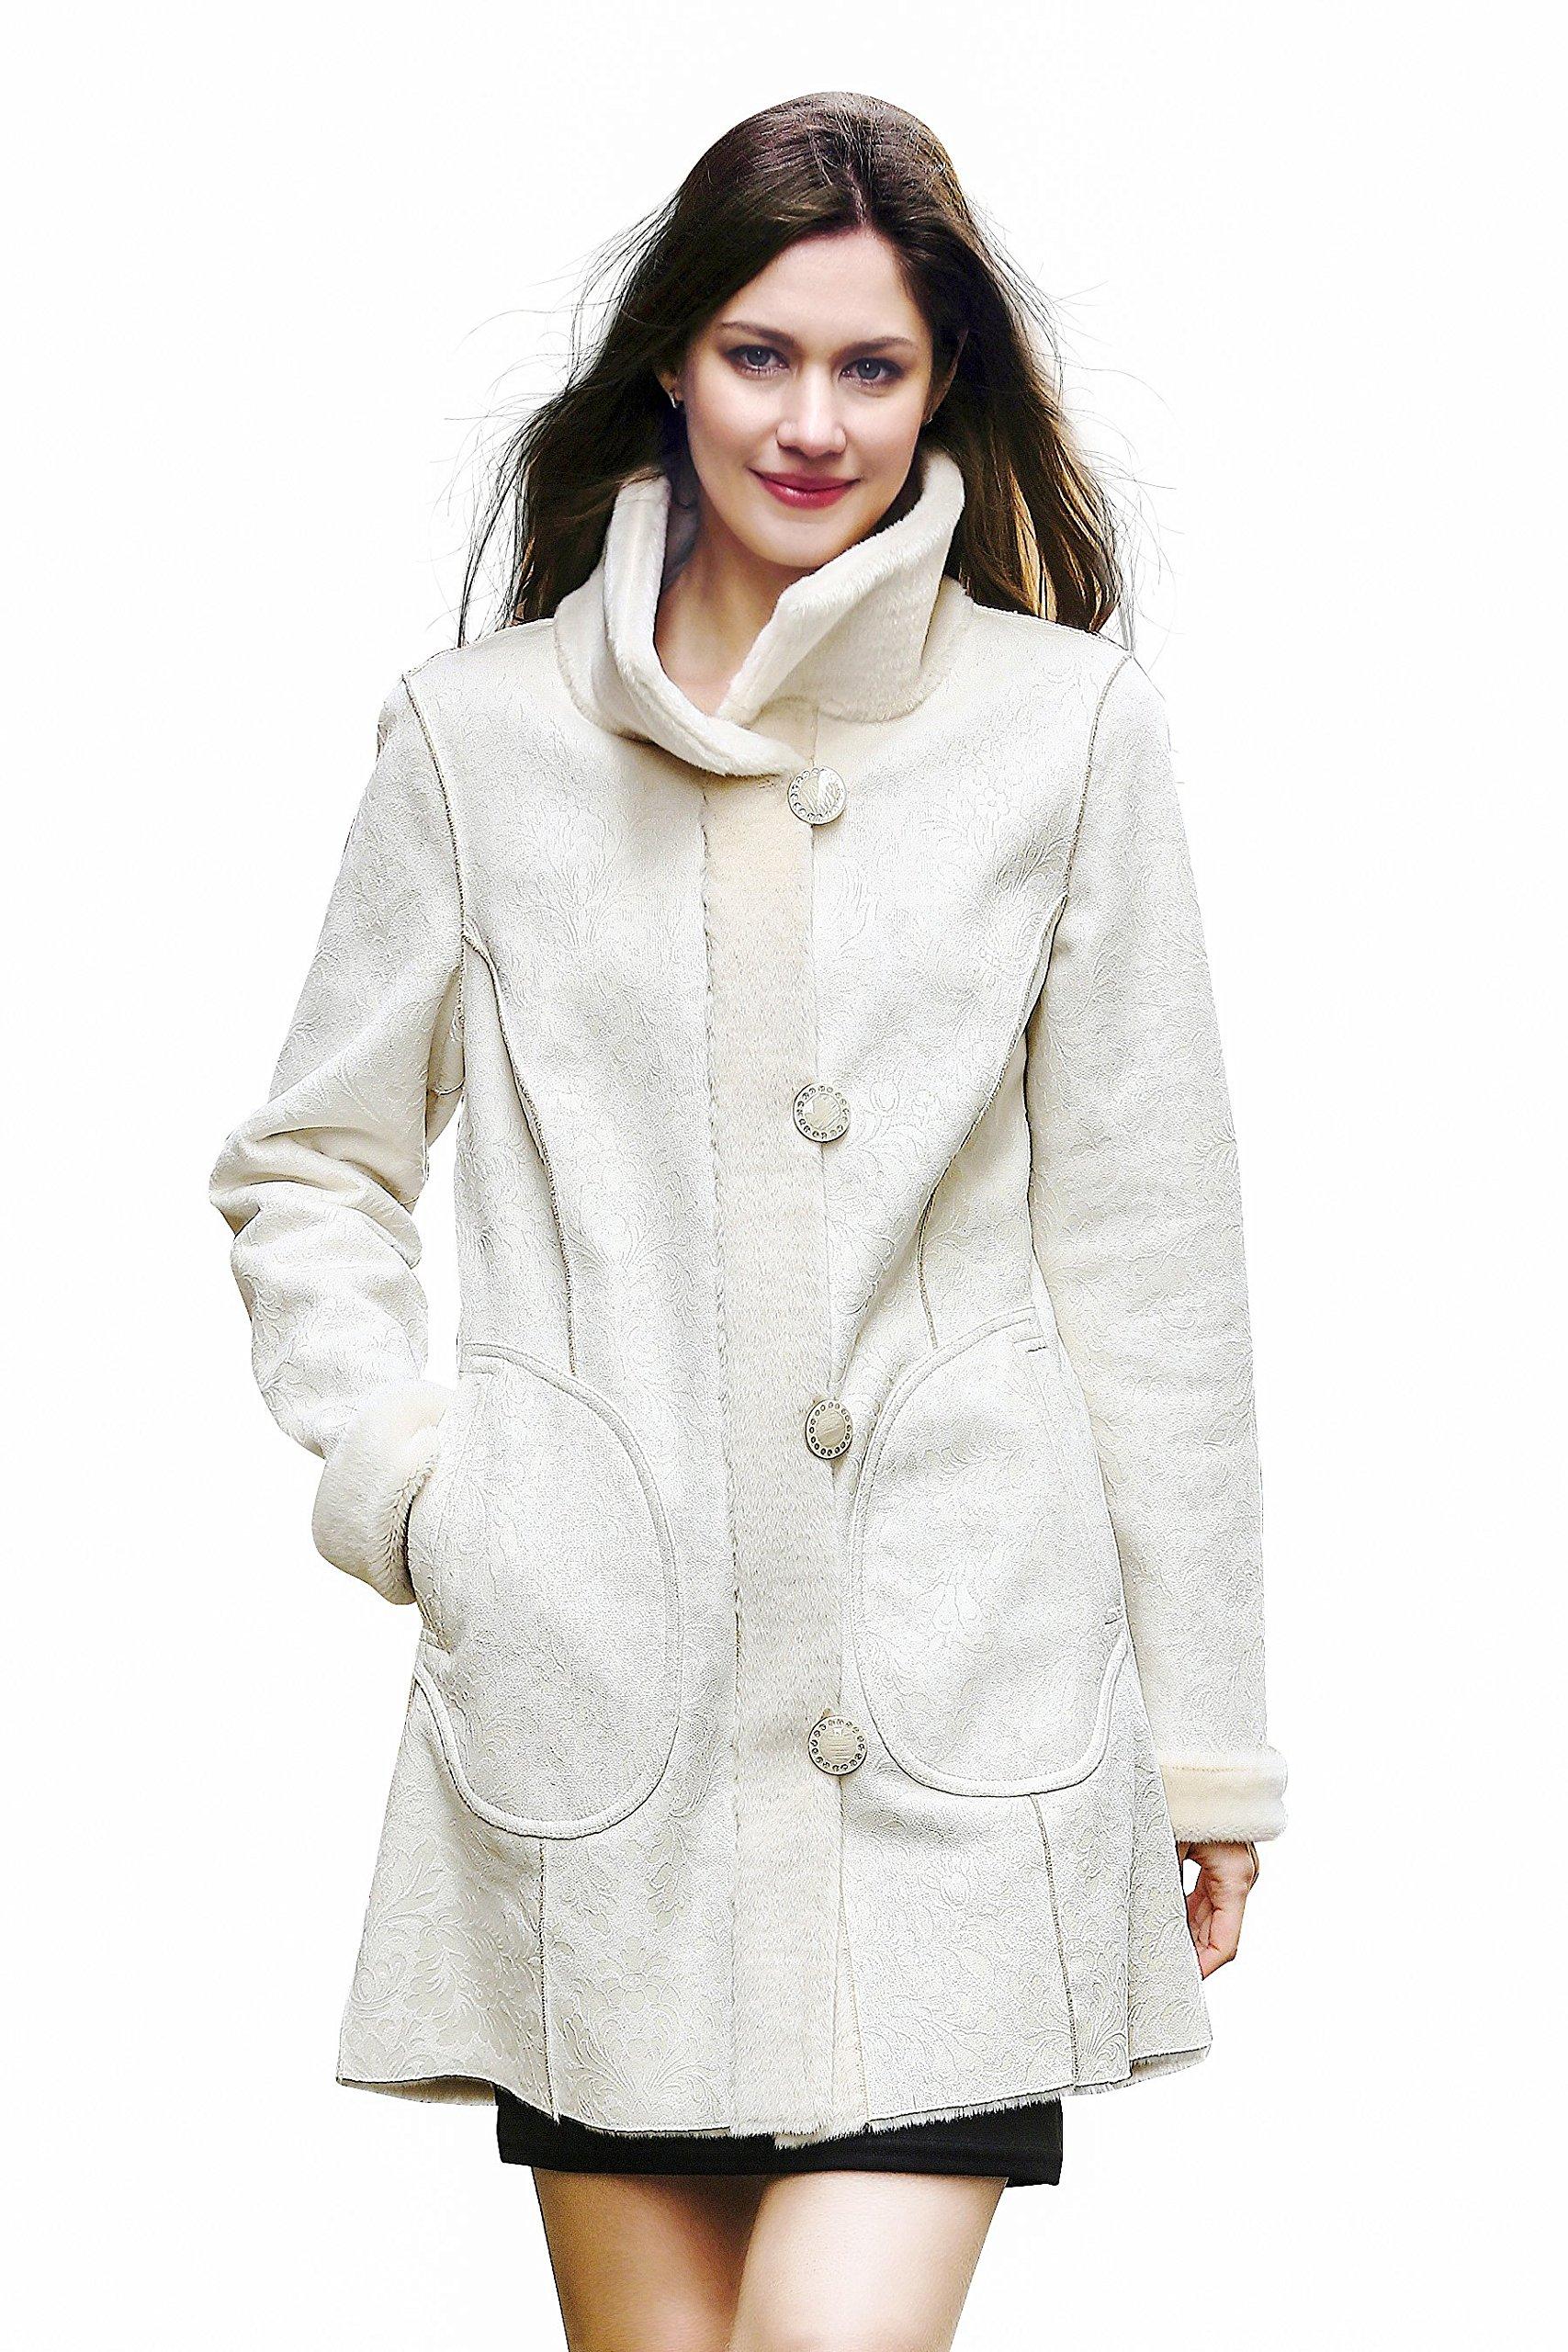 Adelaqueen Faux Fur Coat Jacket Women Ivory Long Sleeve Coat Jacket Large Winter Coat Clothing Plus Fluffy Fake Fur Coat Thick Cheap Fashion Faux Fur Lady Coat Outerwear Shaggy Fuzzy Elegant Coat XL